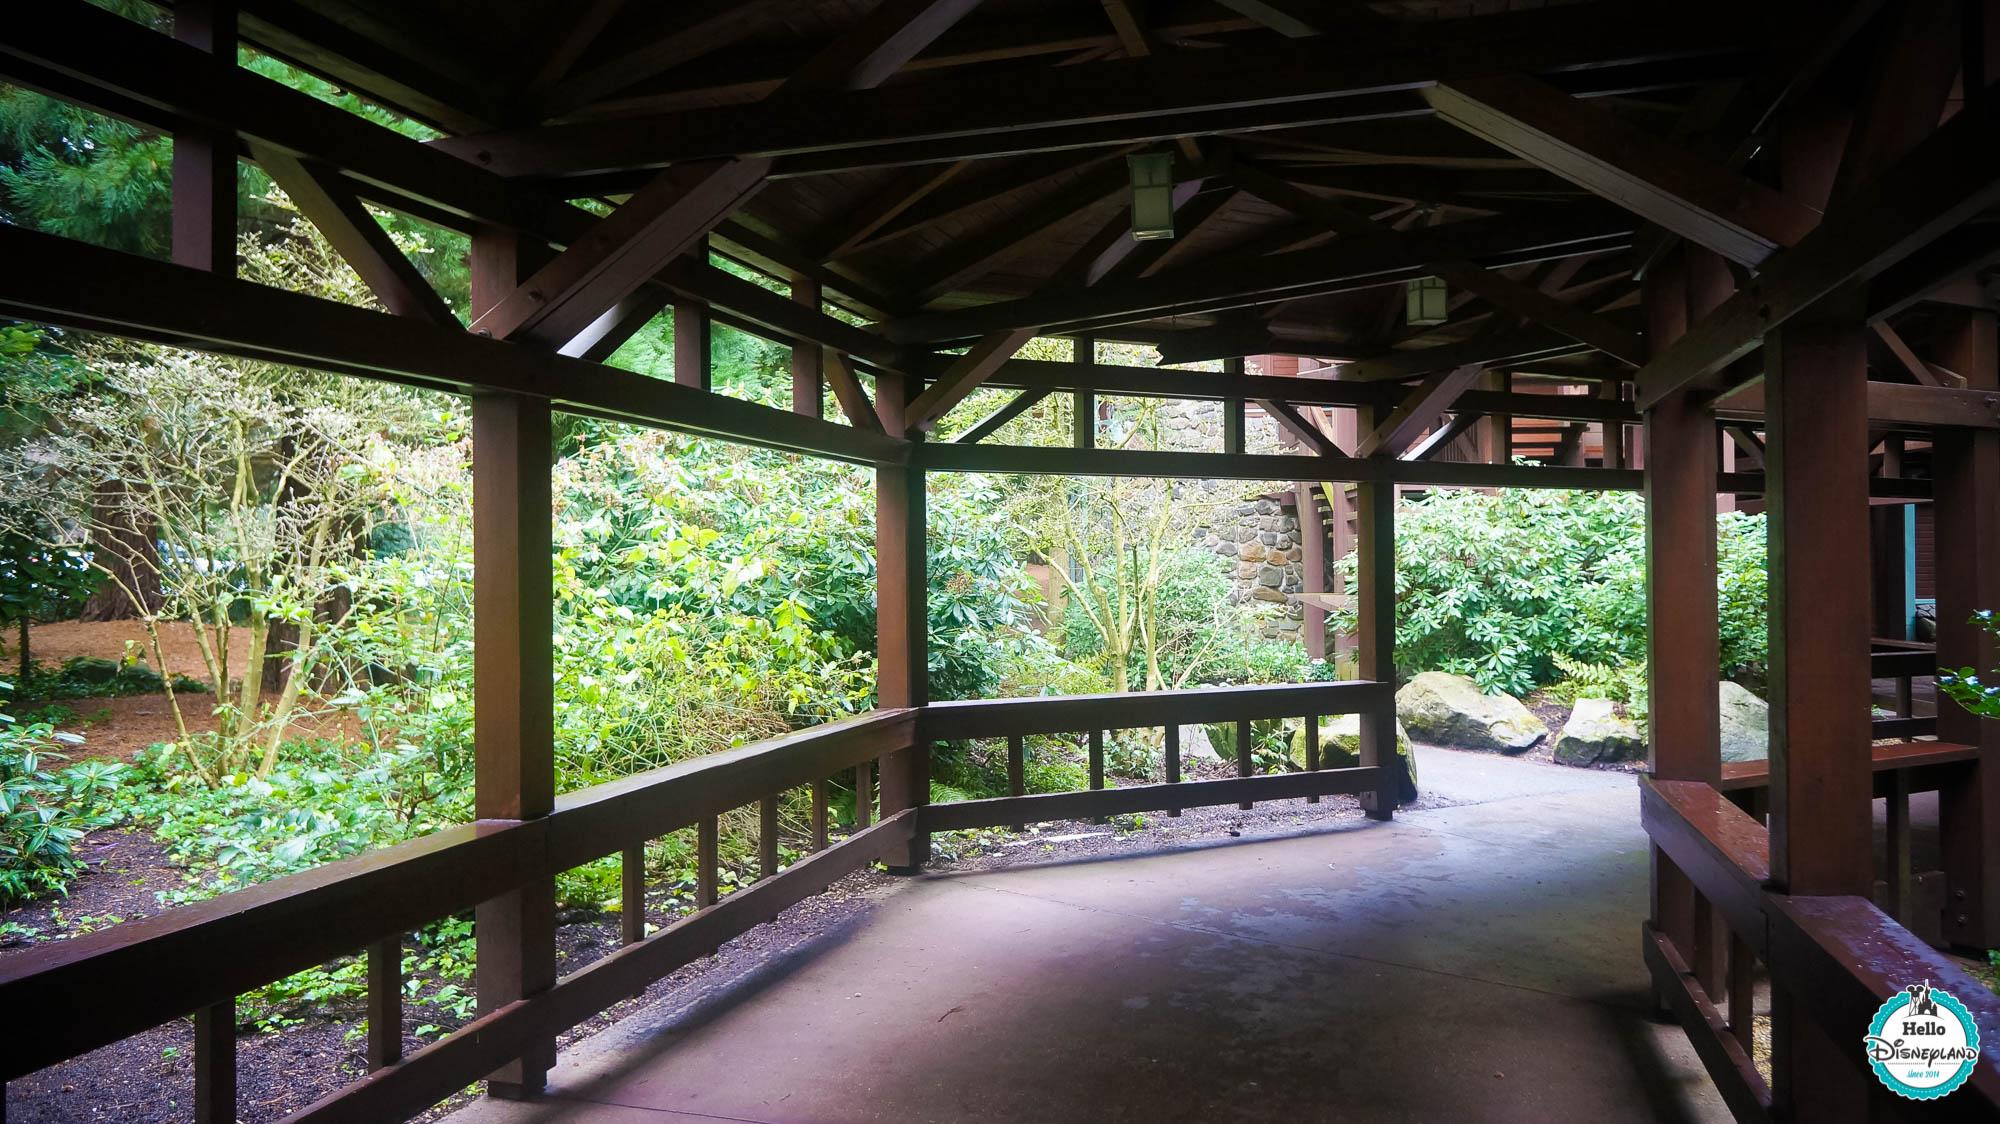 Disney's Sequoia Lodge | Hello Disneyland : Le blog n°1 sur ...